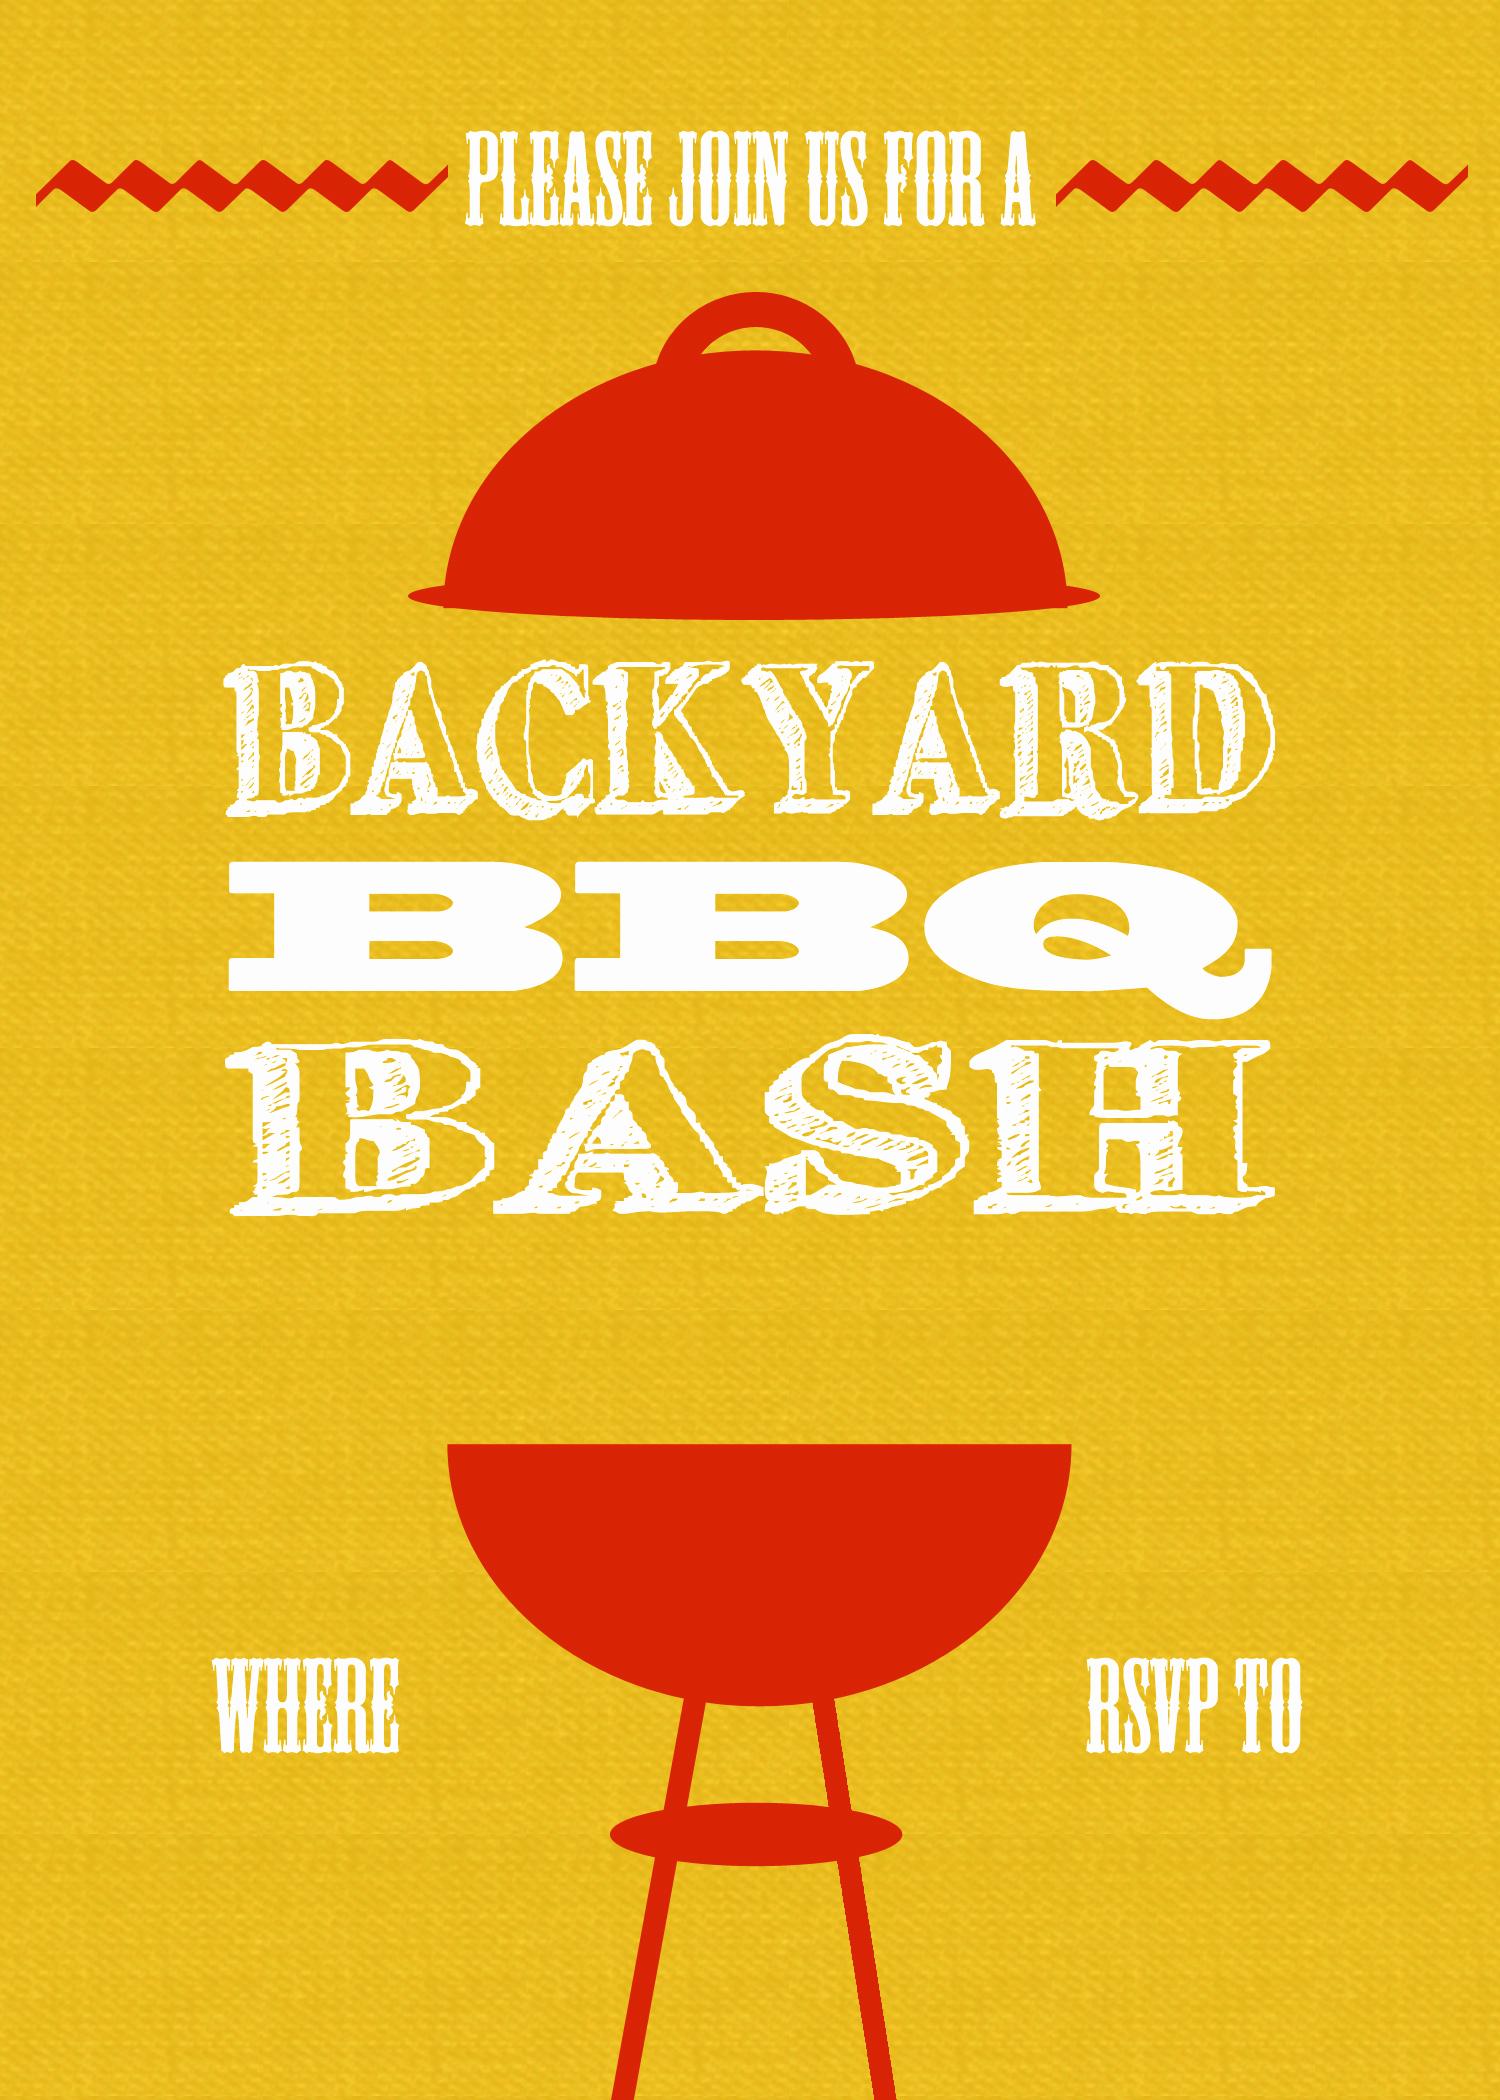 Free Bbq Invitation Template Lovely Diy Printable Backyard Bbq Bash Invite